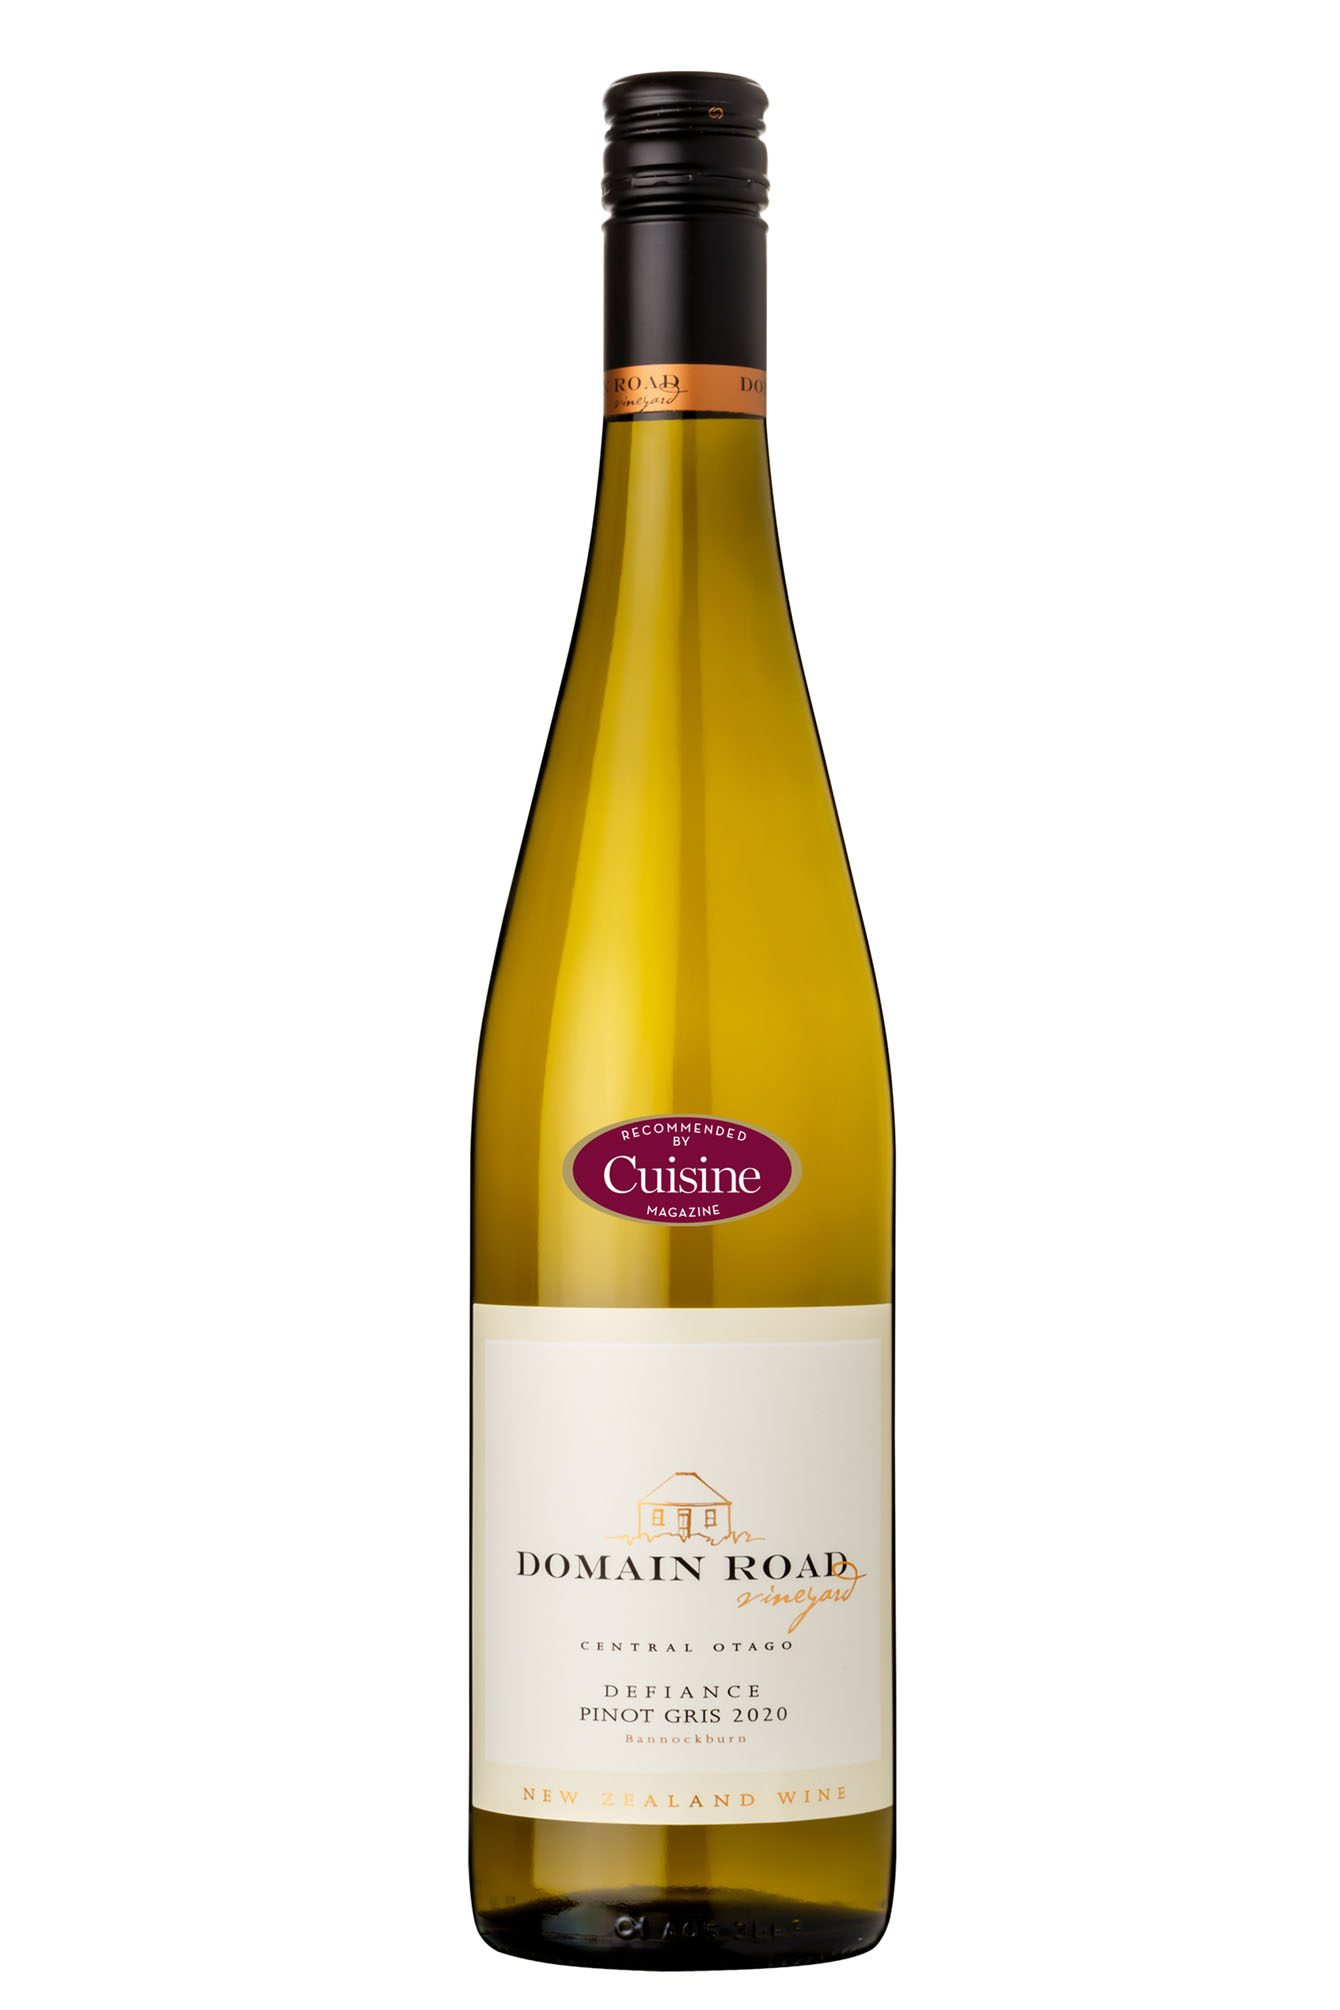 Domain Road Vineyard – Defiance Pinot Gris 2020 (Bannockburn)